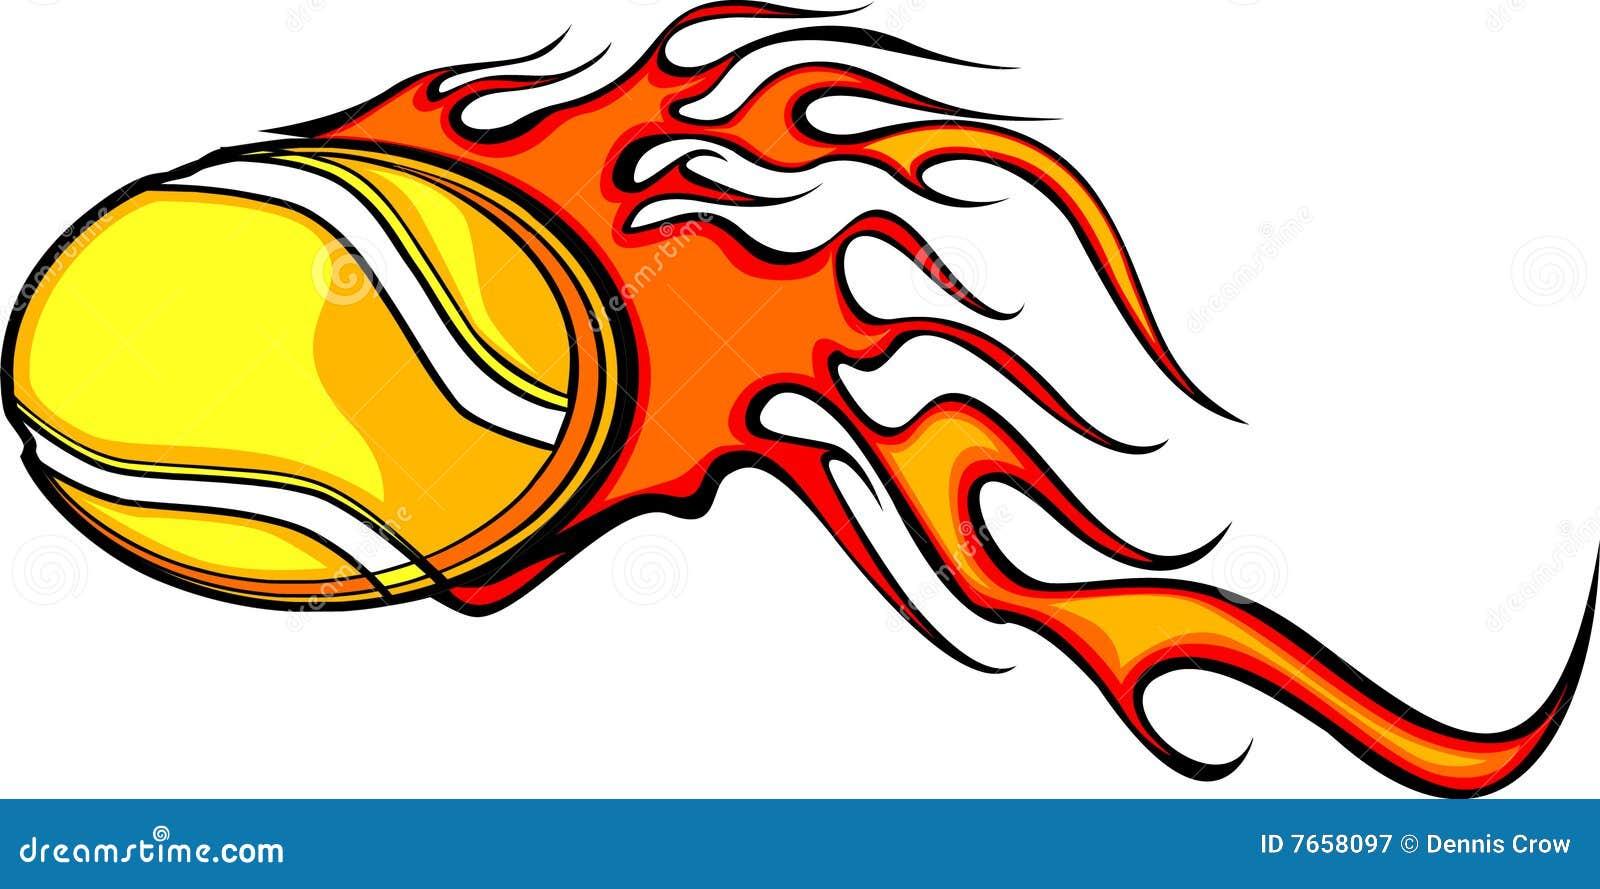 flaming tennis ball royalty free stock photography image